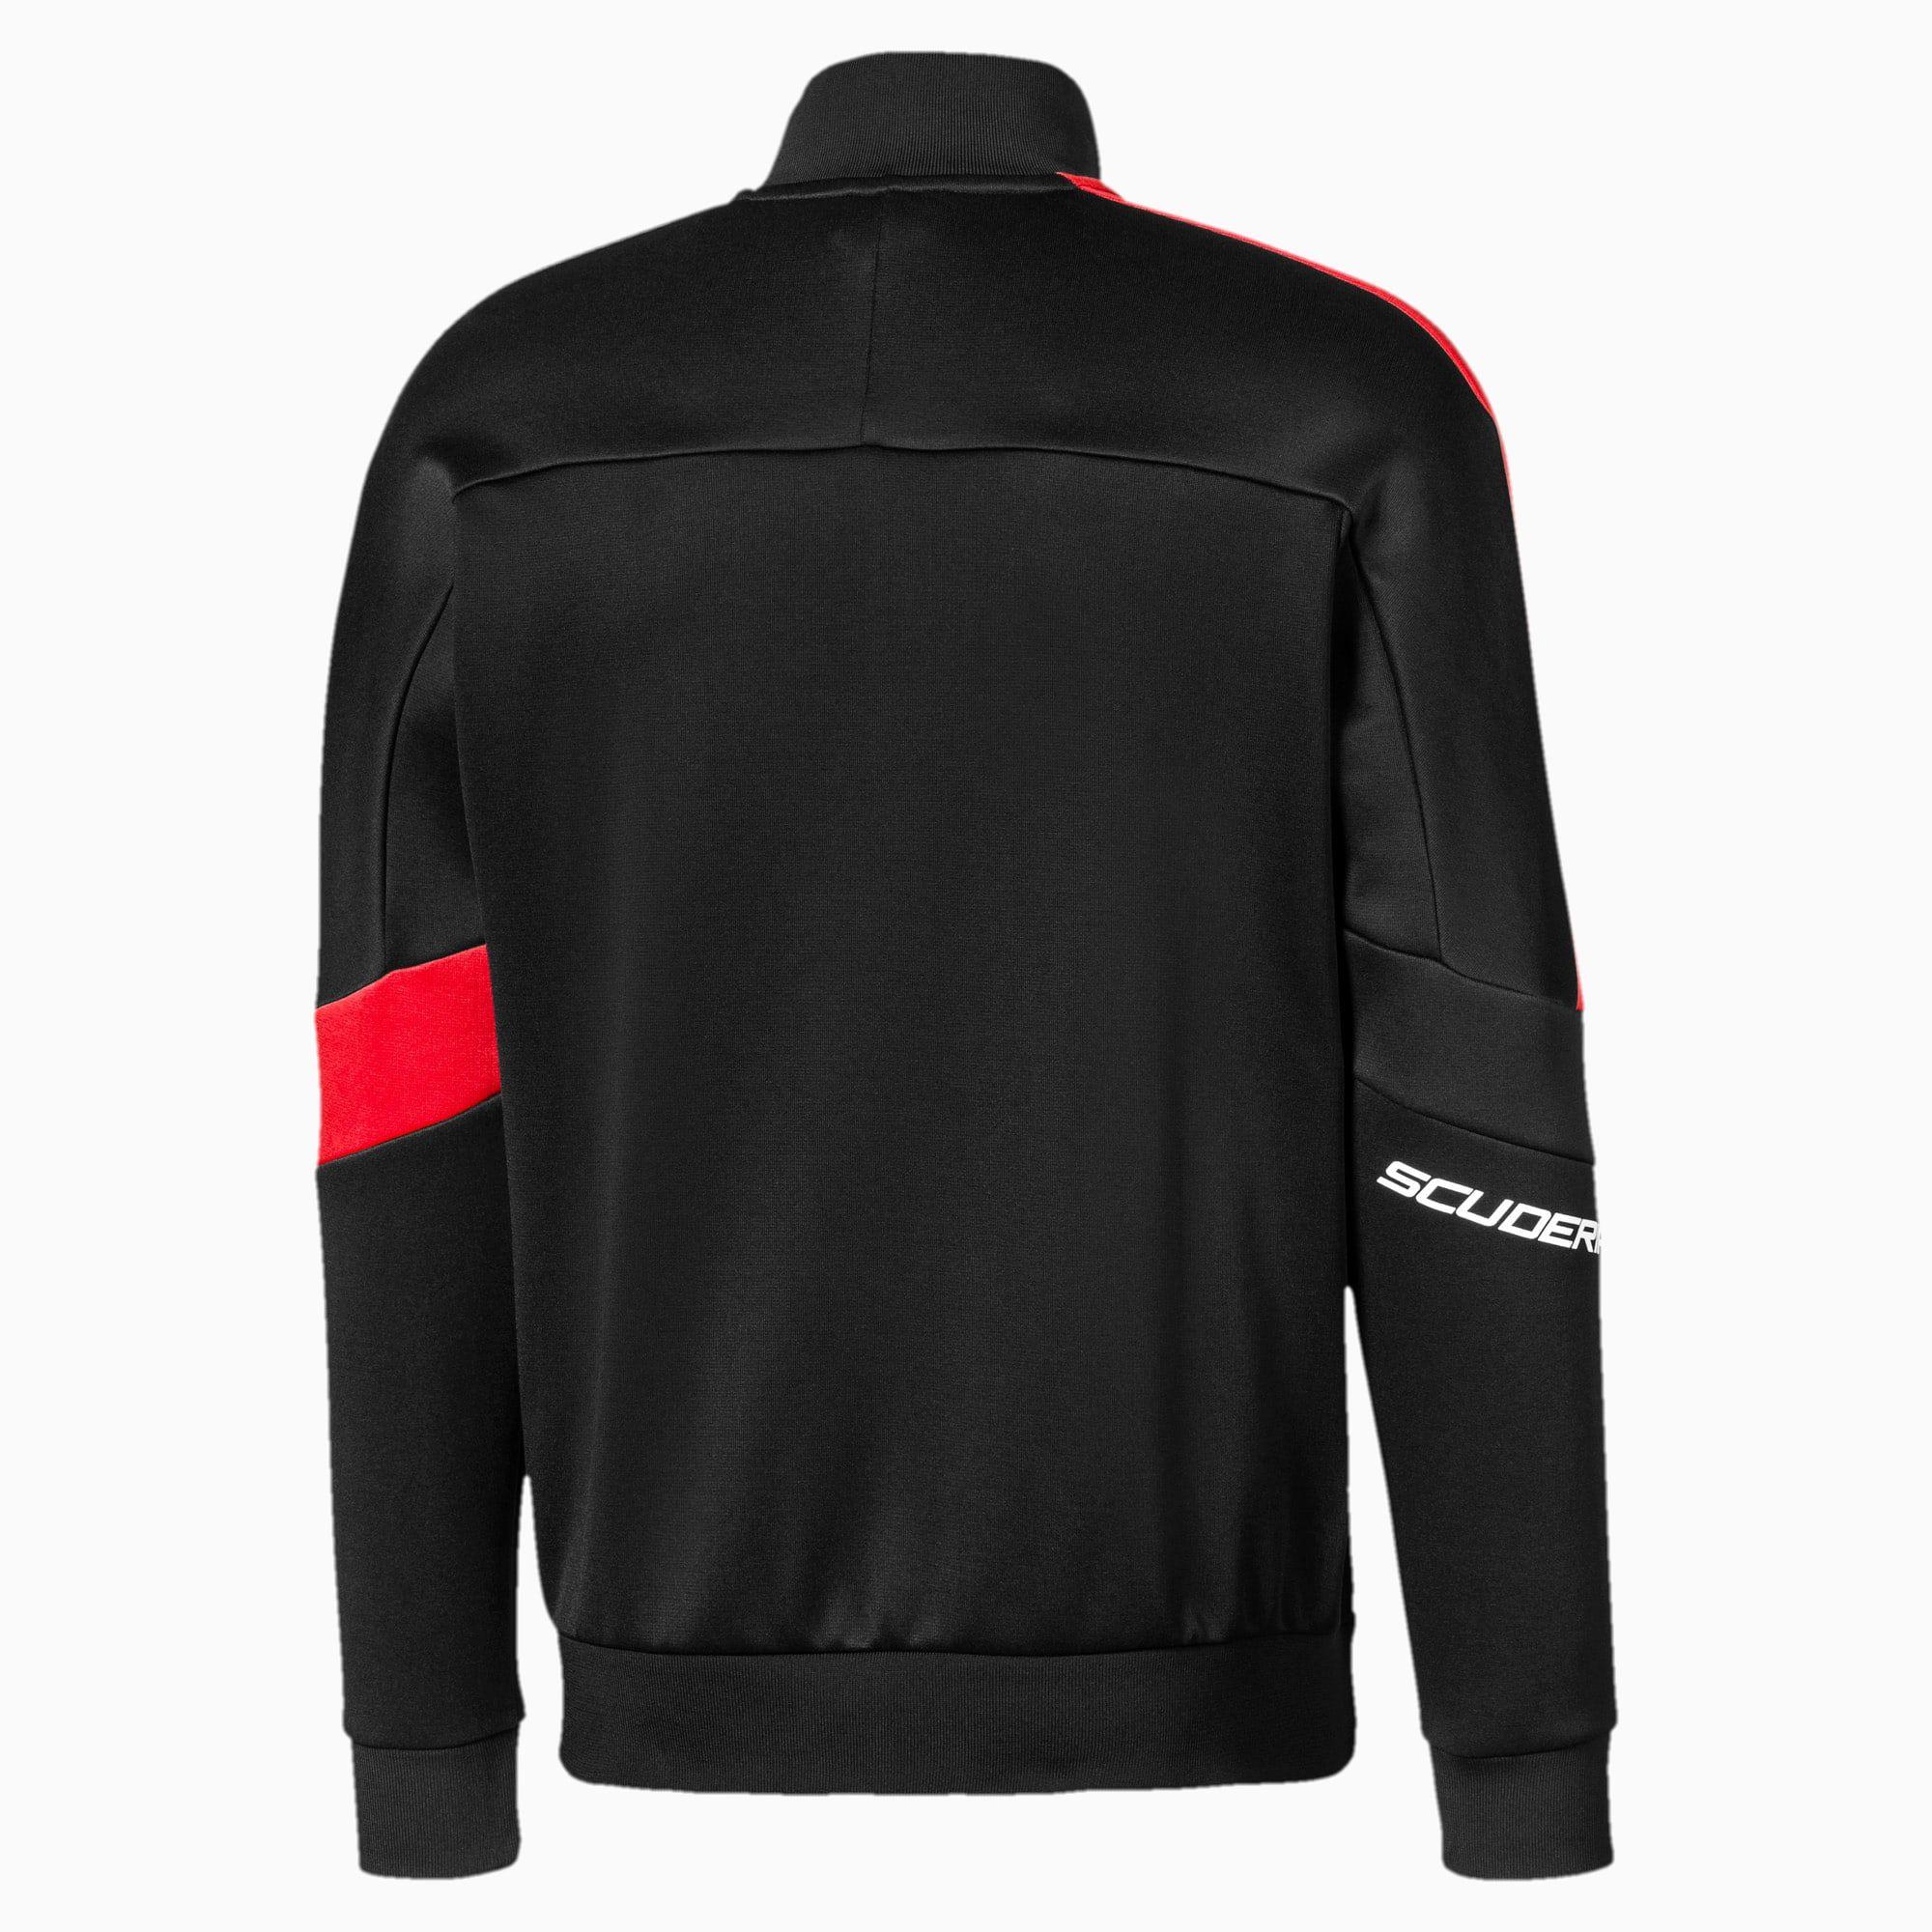 Scuderia Ferrari Men S T7 Track Jacket Puma Us In 2020 Track Jackets Jackets Puma Jackets [ 2000 x 2000 Pixel ]